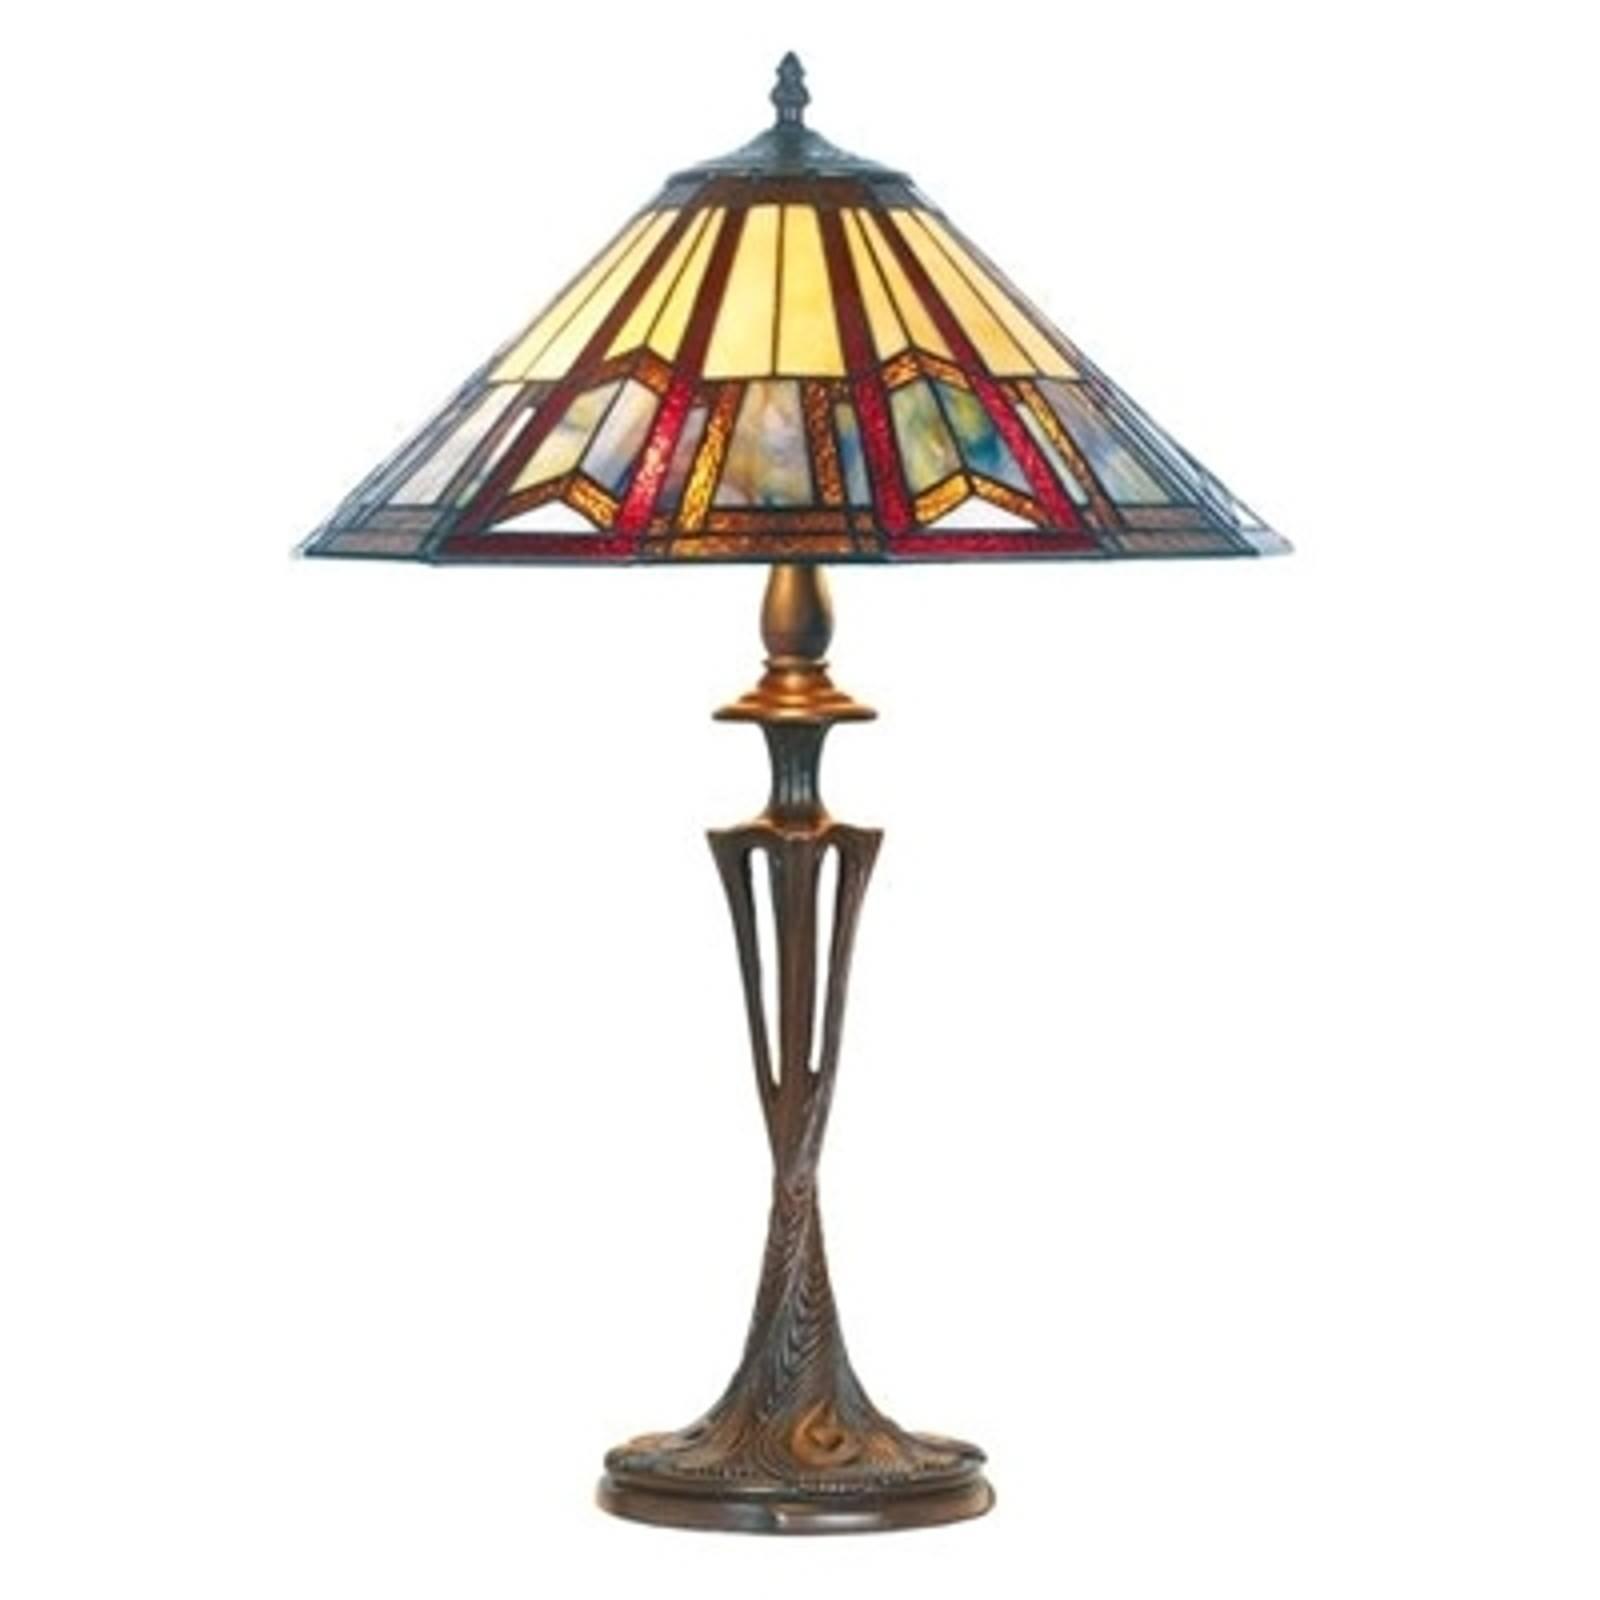 Lampe à poser Lillie au style Tiffany